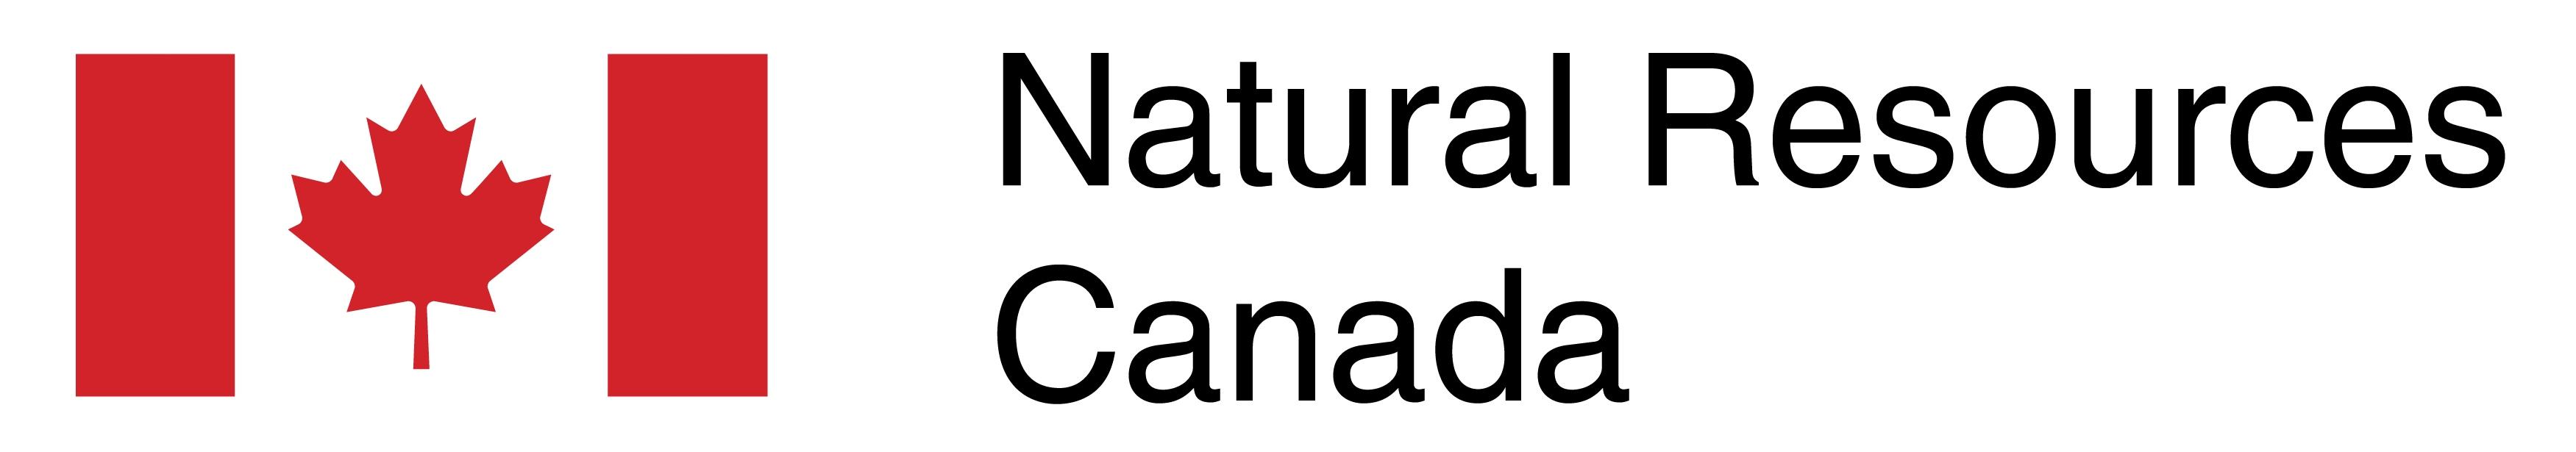 NRCan-Canada_E